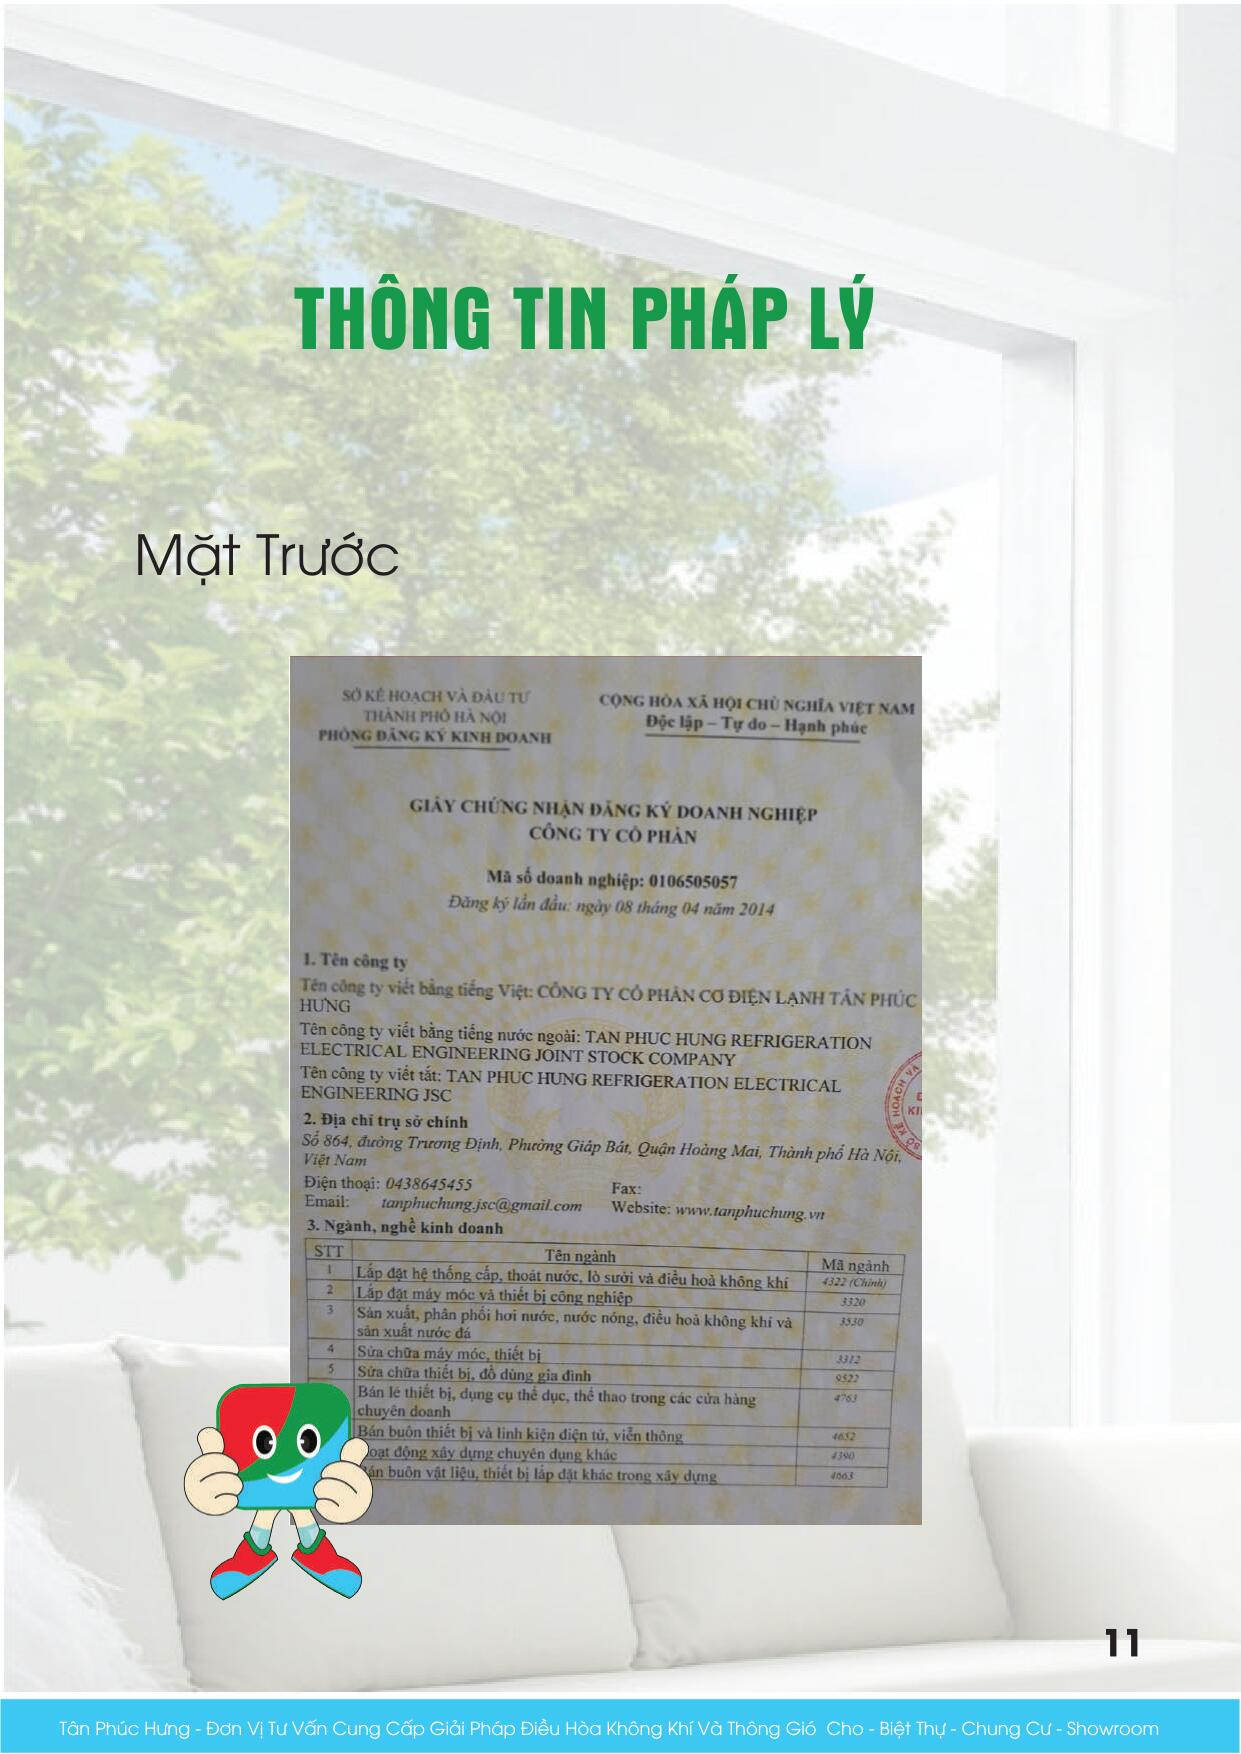 Profile Ho So Nang Luc Cong Ty Tan Phuc Hung 11